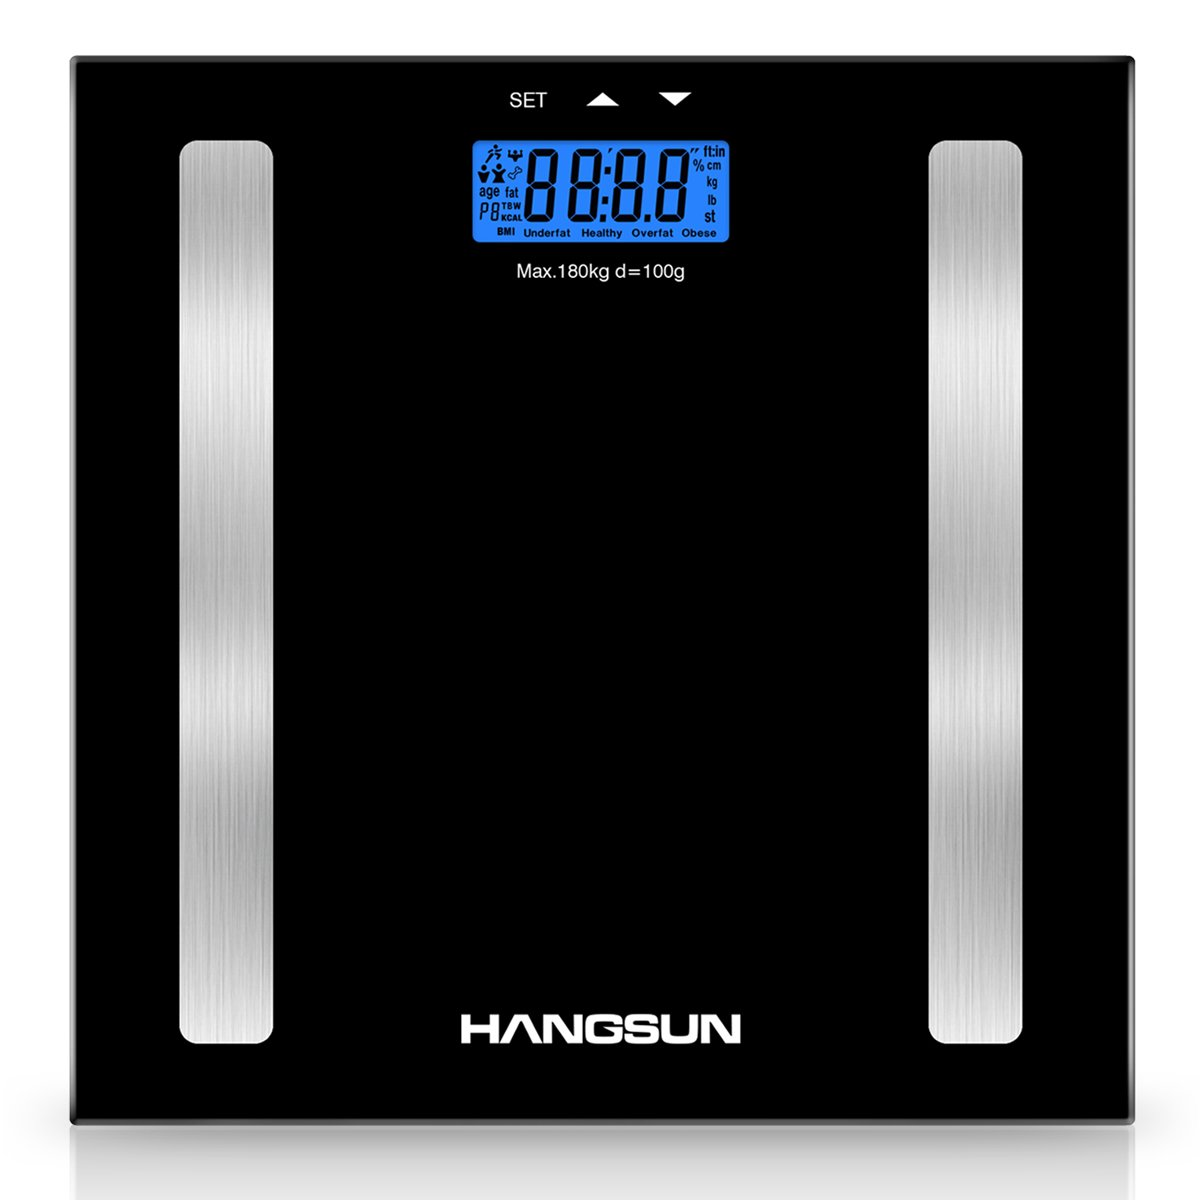 Hangsun Bilancia Pesapersone Professionale Digitale HS100 Bilancia Diagnostica impedenziometrica Elettronica